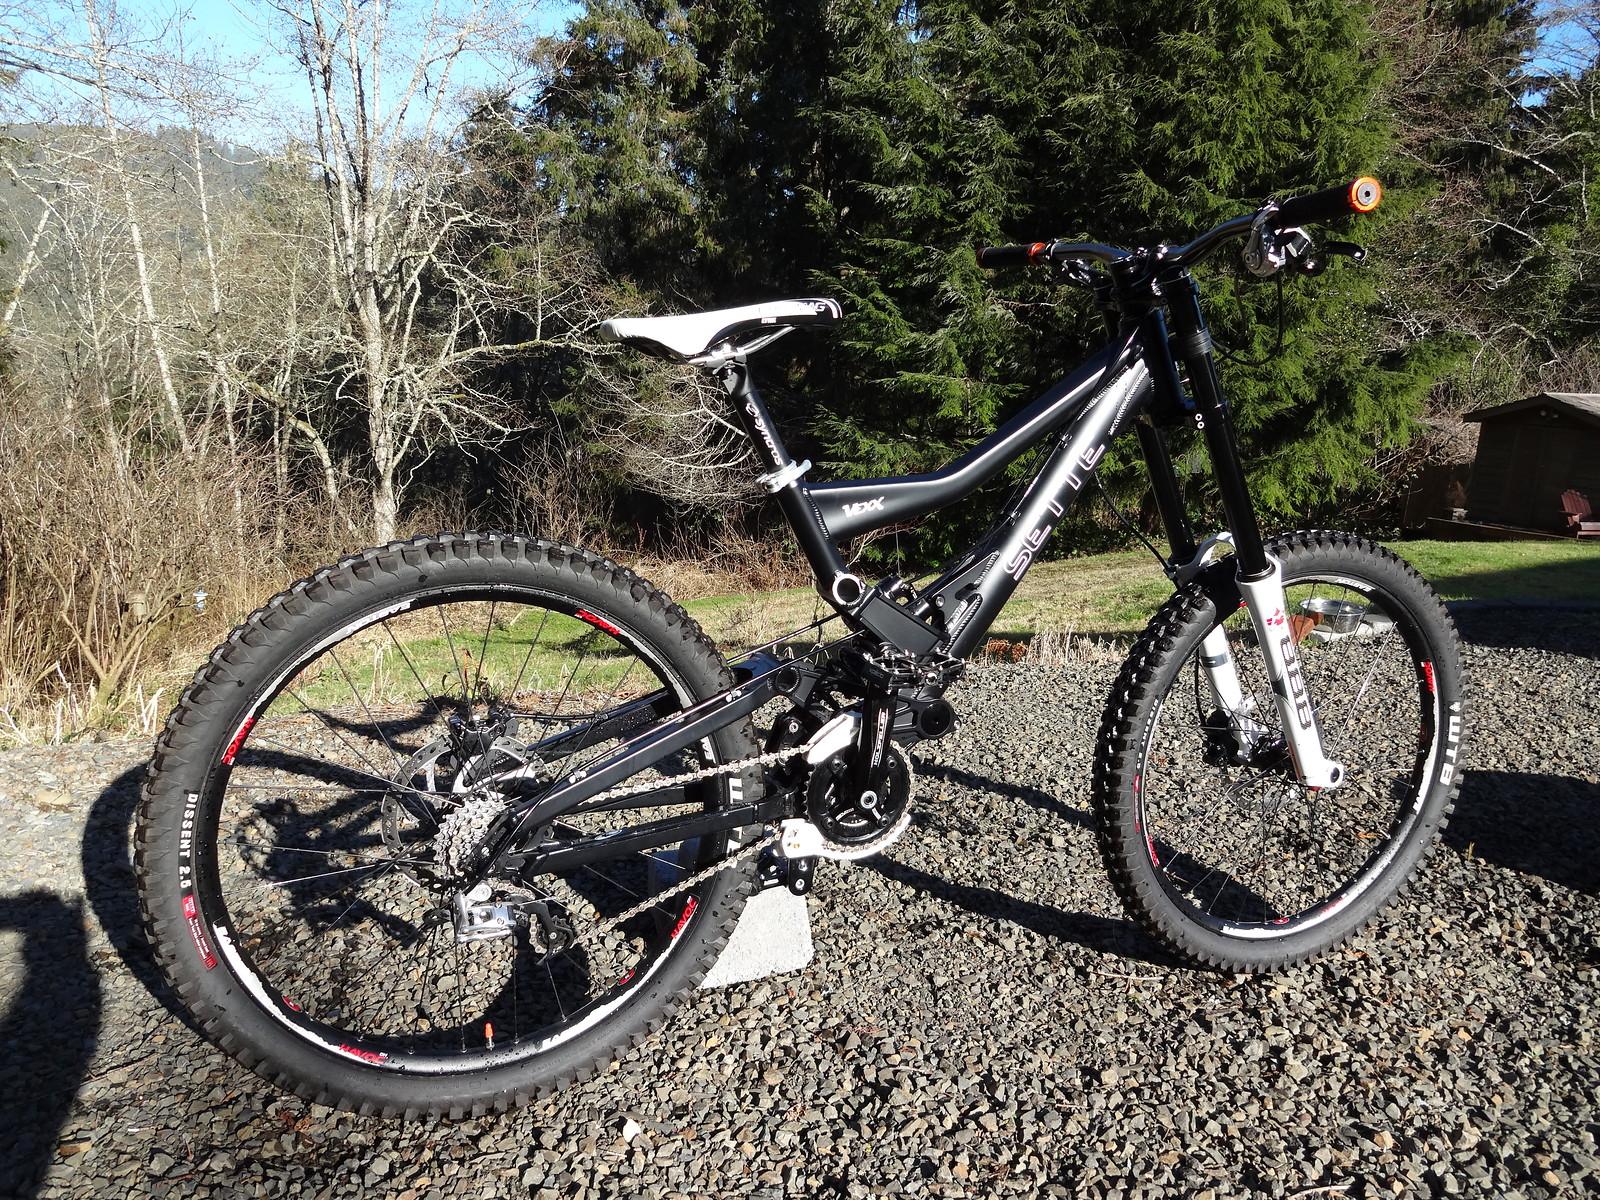 Sette Vexx (My Bargain DH Bike)